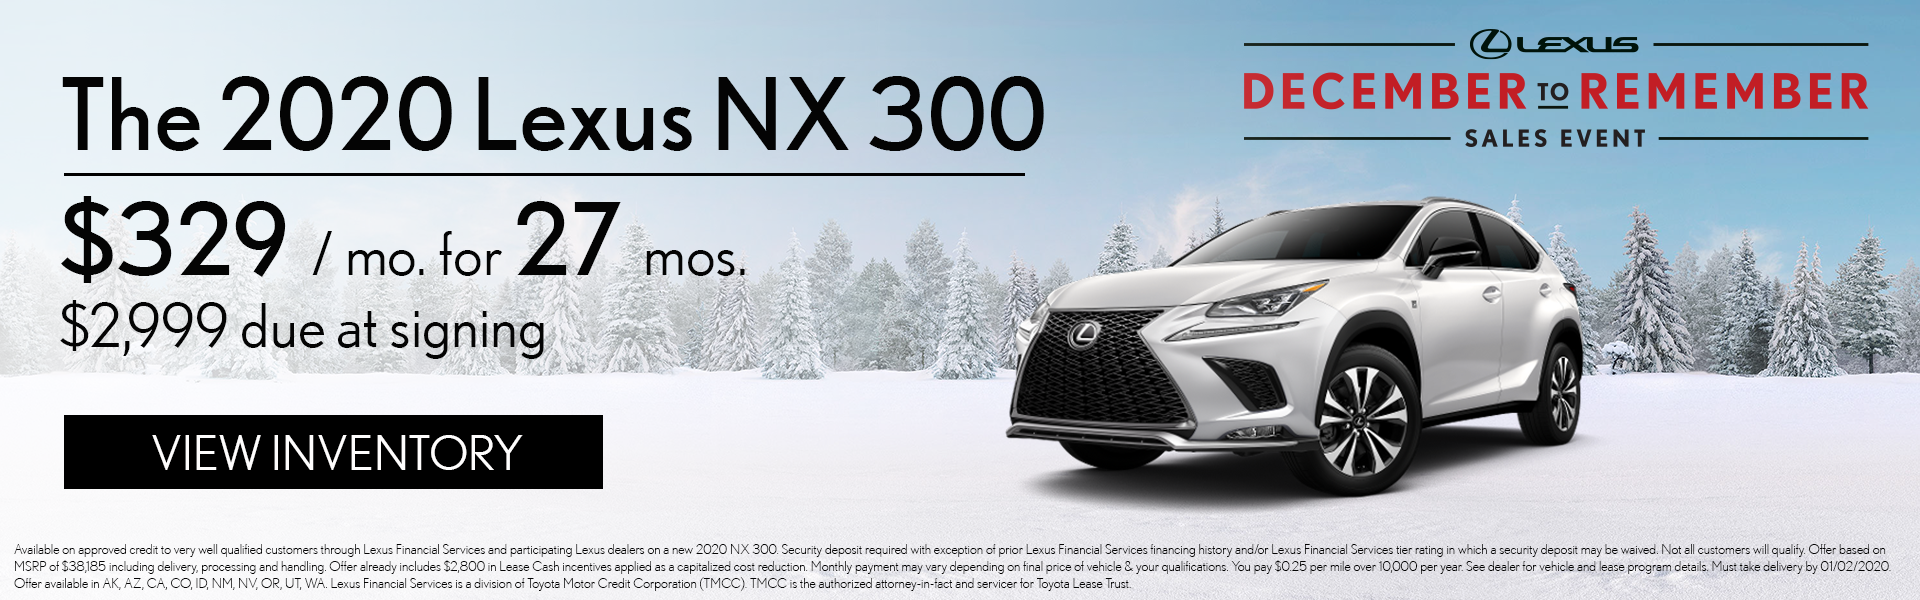 NX 300 2020